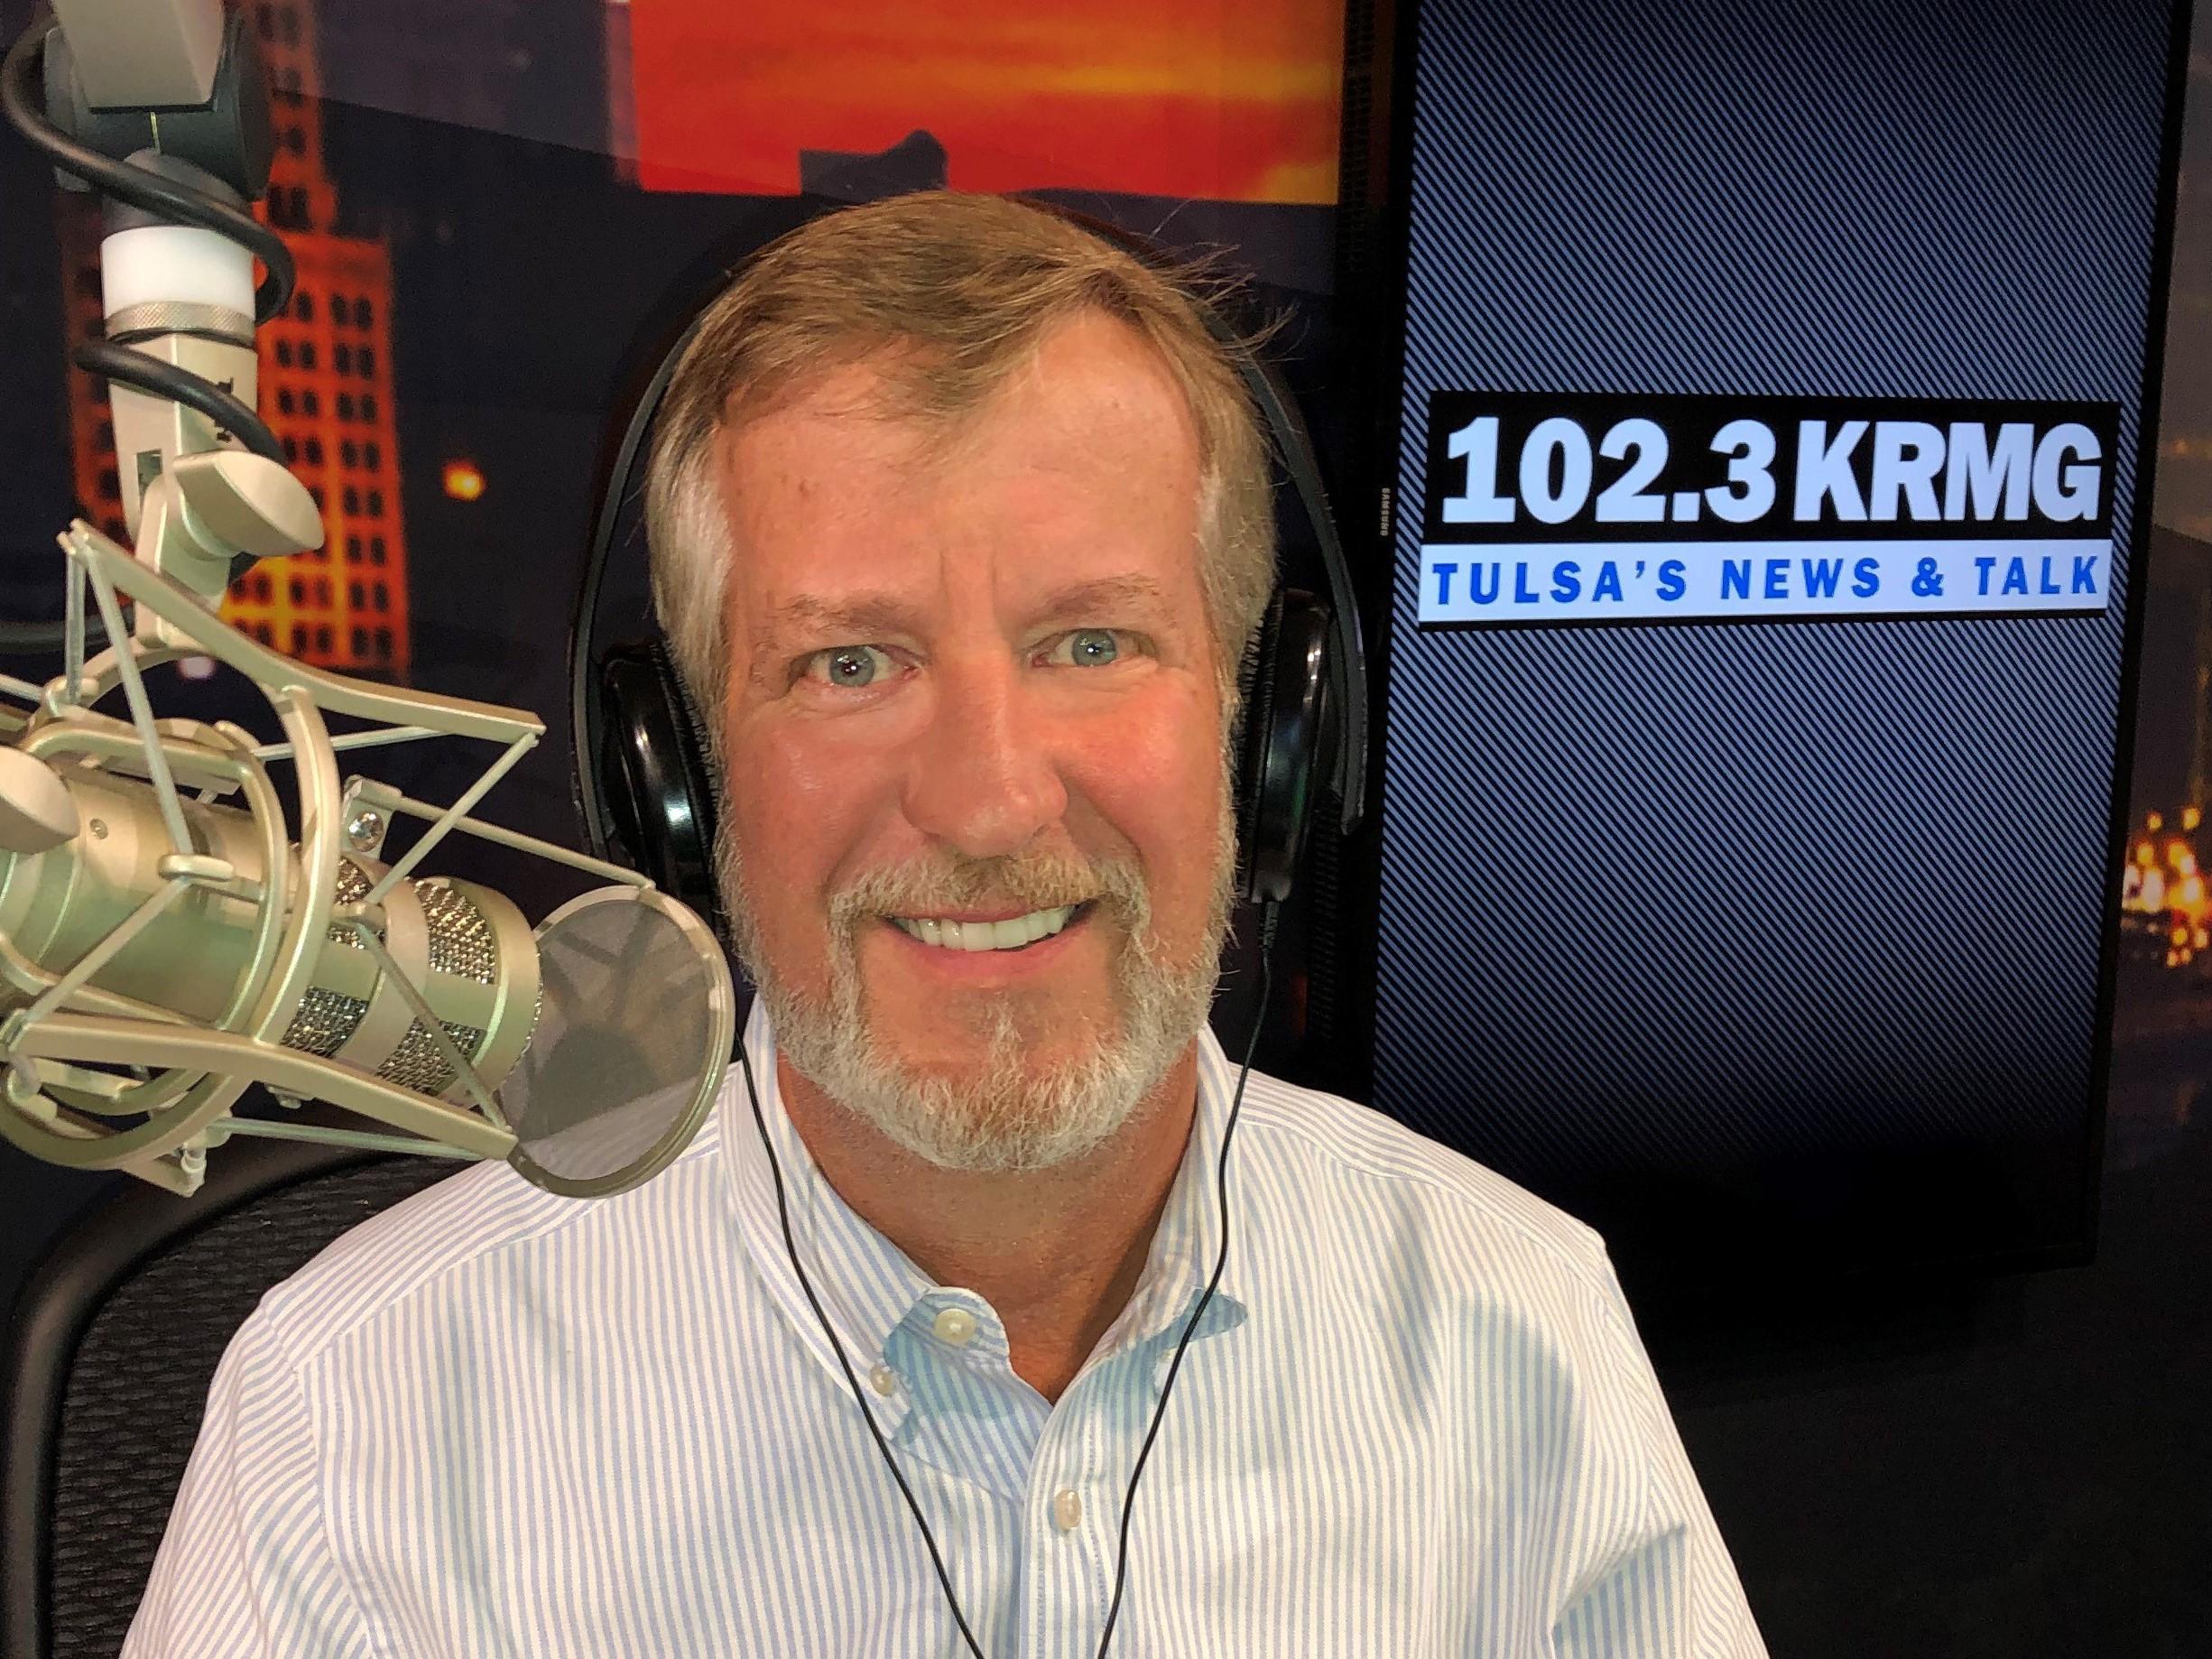 KRMG Morning News Podcast